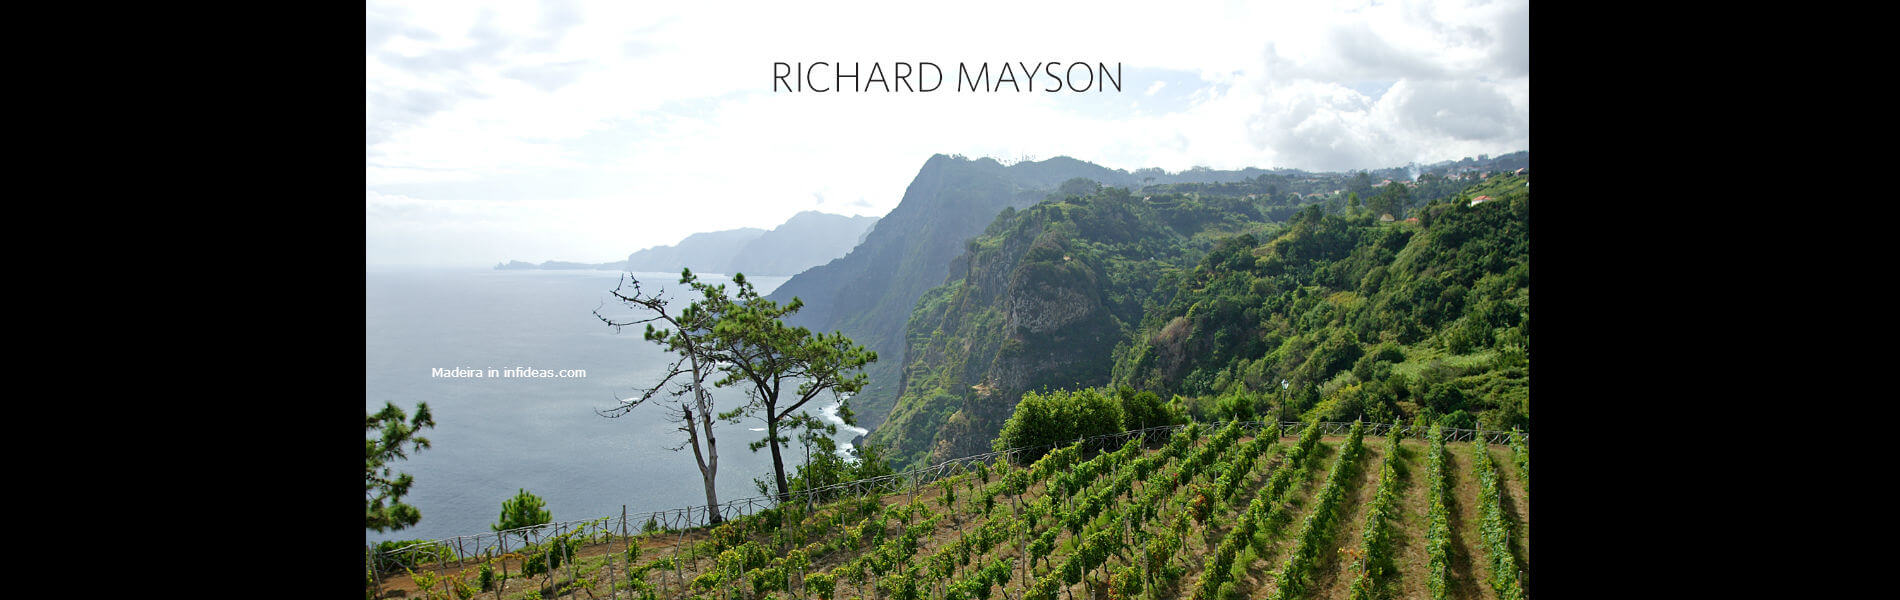 Blend-All-About-Wine-Richard-Mayson-Madeira-Wines-Slider